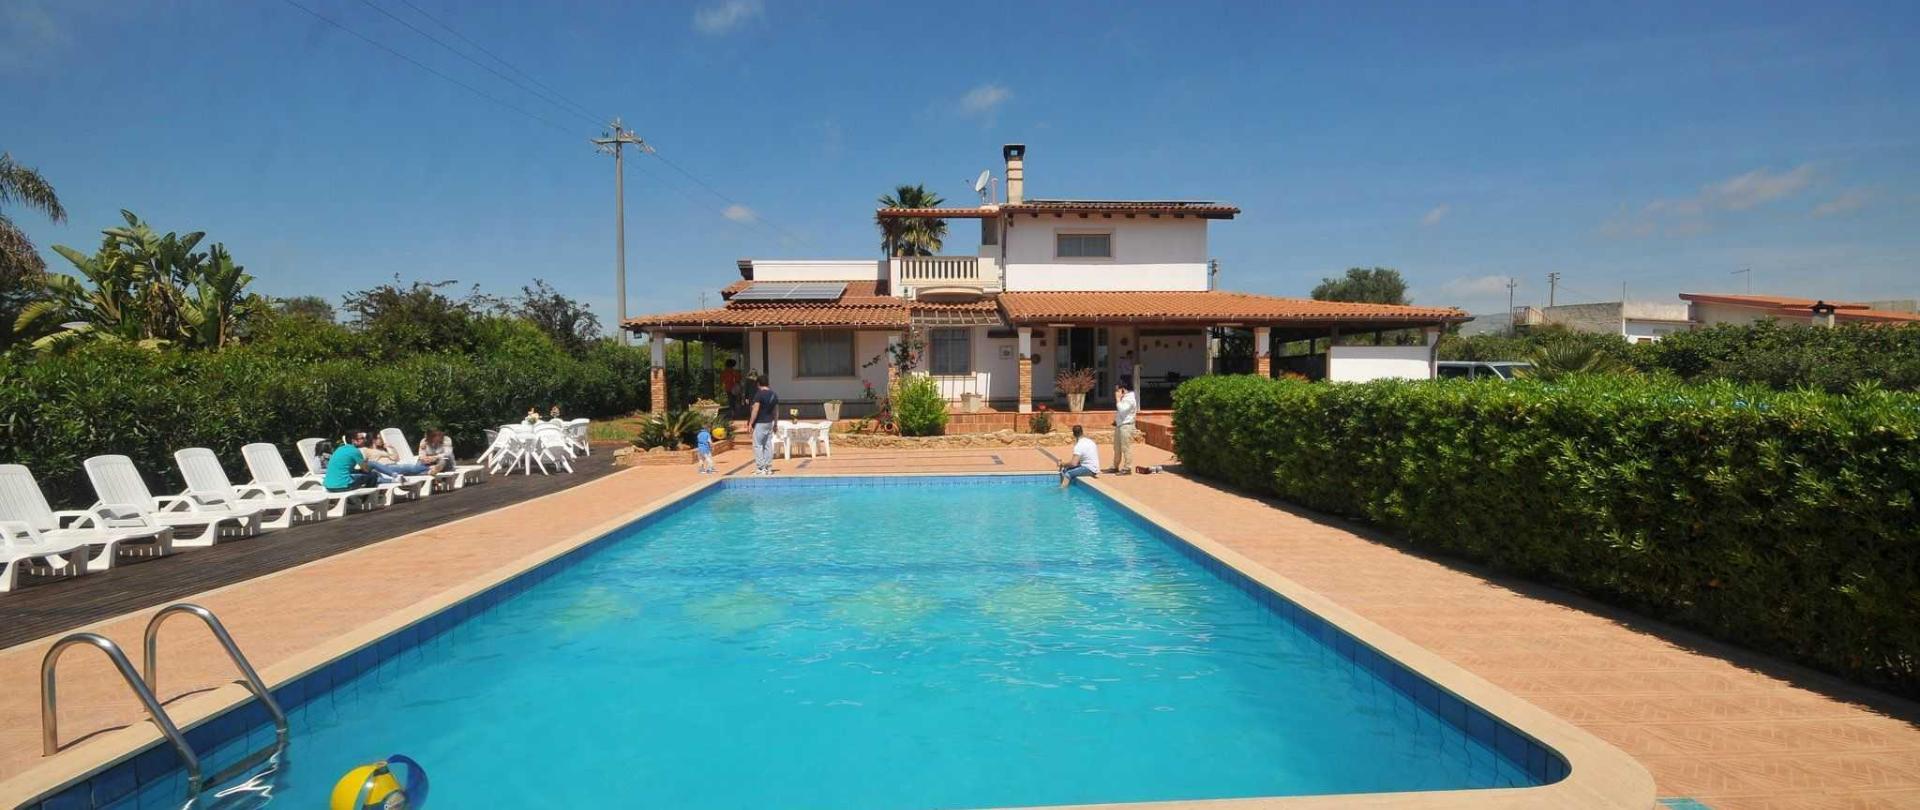 4_resort_noto_il_mandorleto_avola_villa_con_piscina_campagna_siciliana_18.JPG